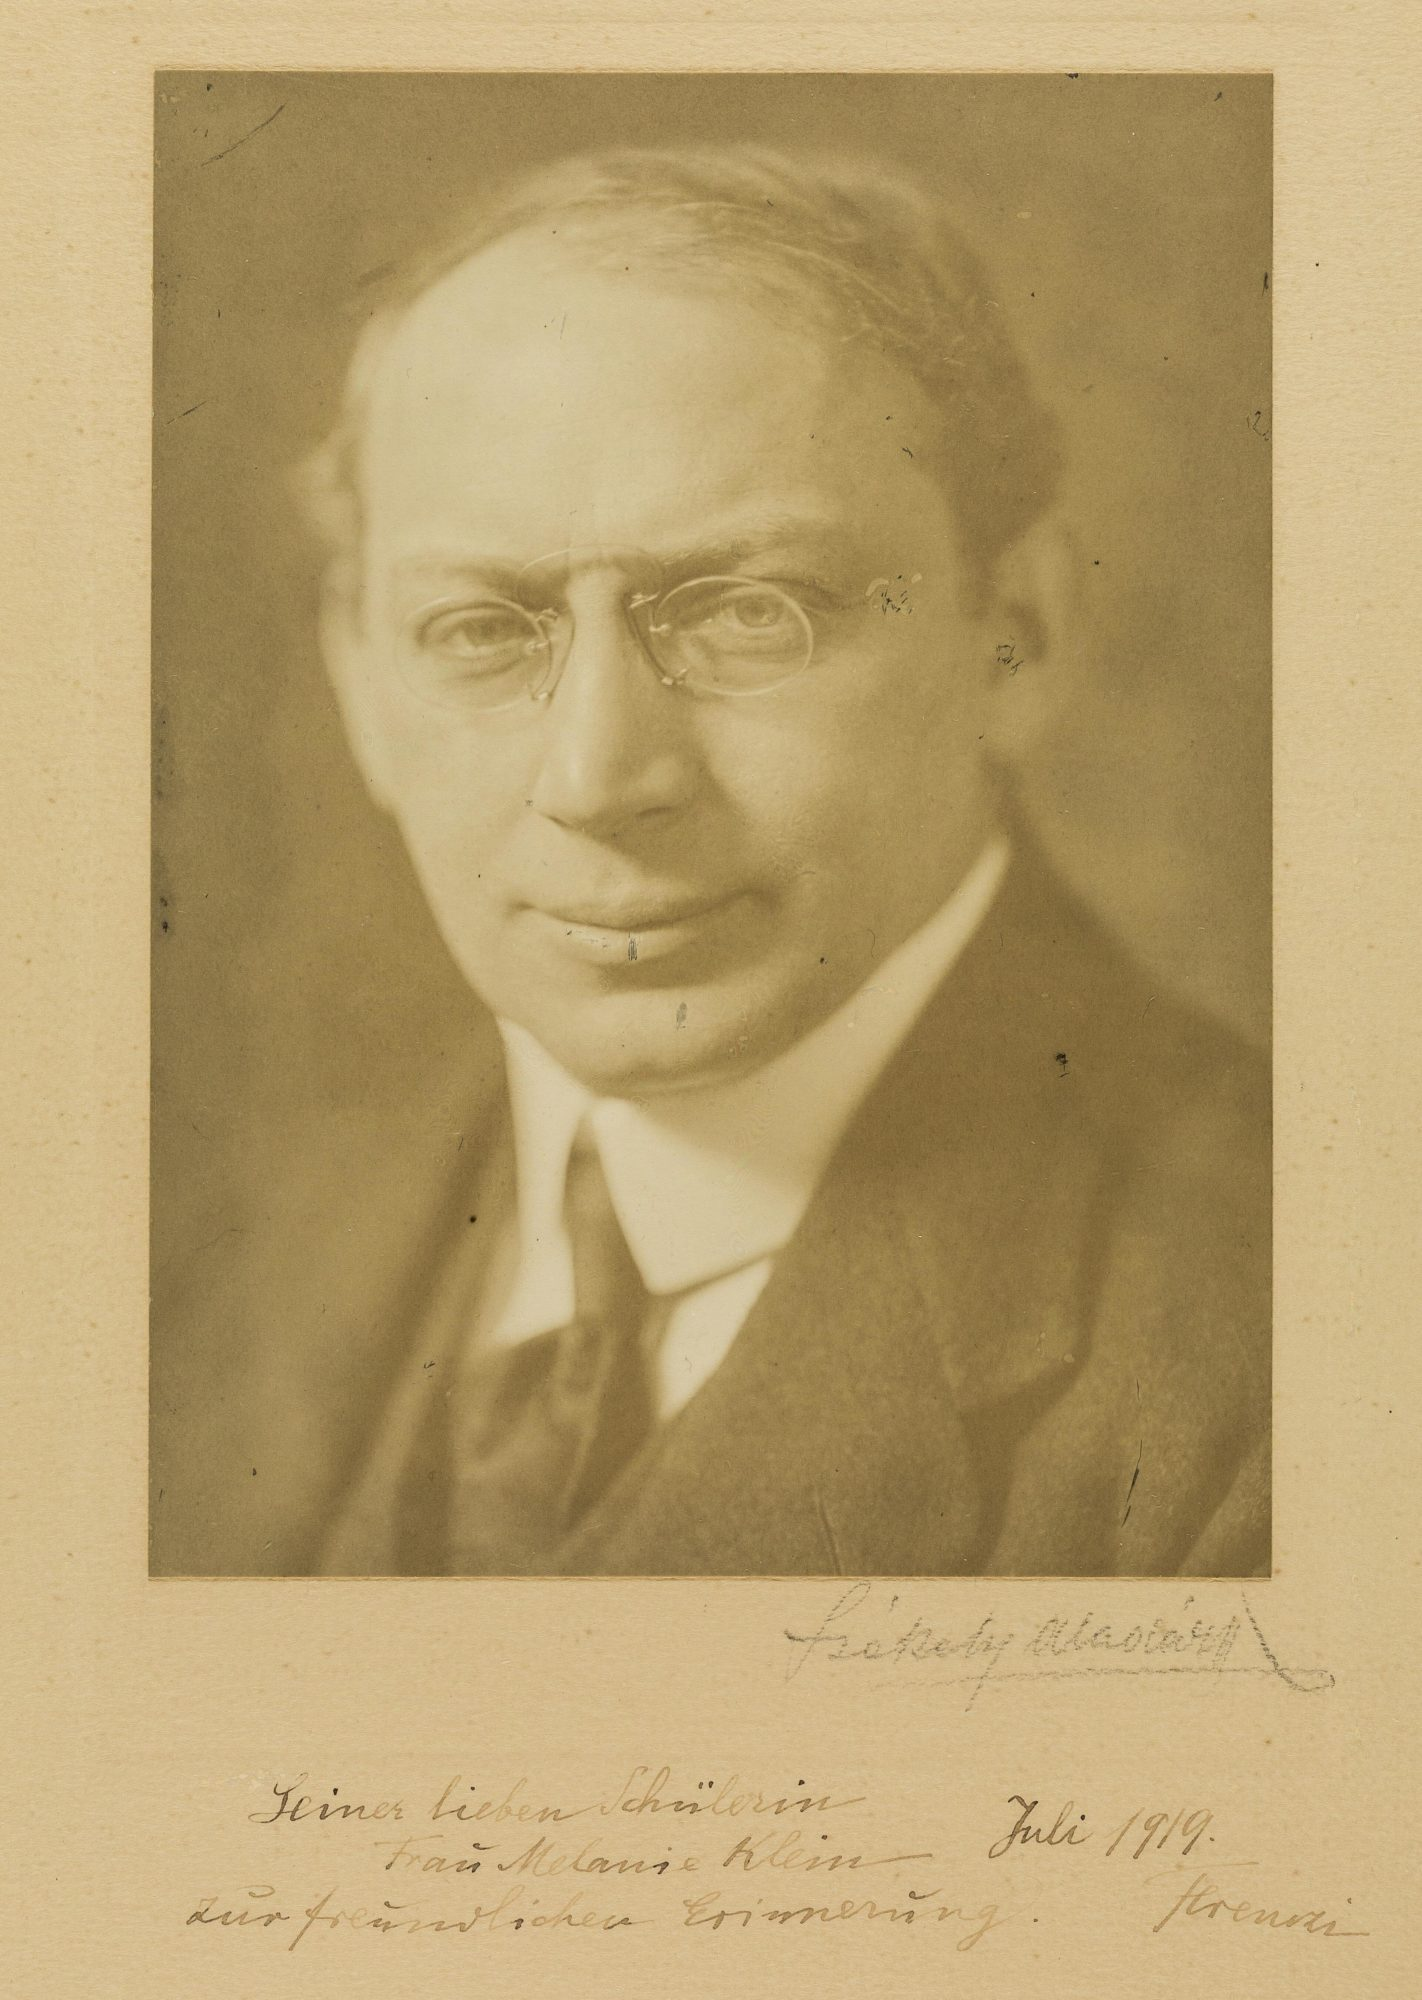 SandorFerenczi, 1919